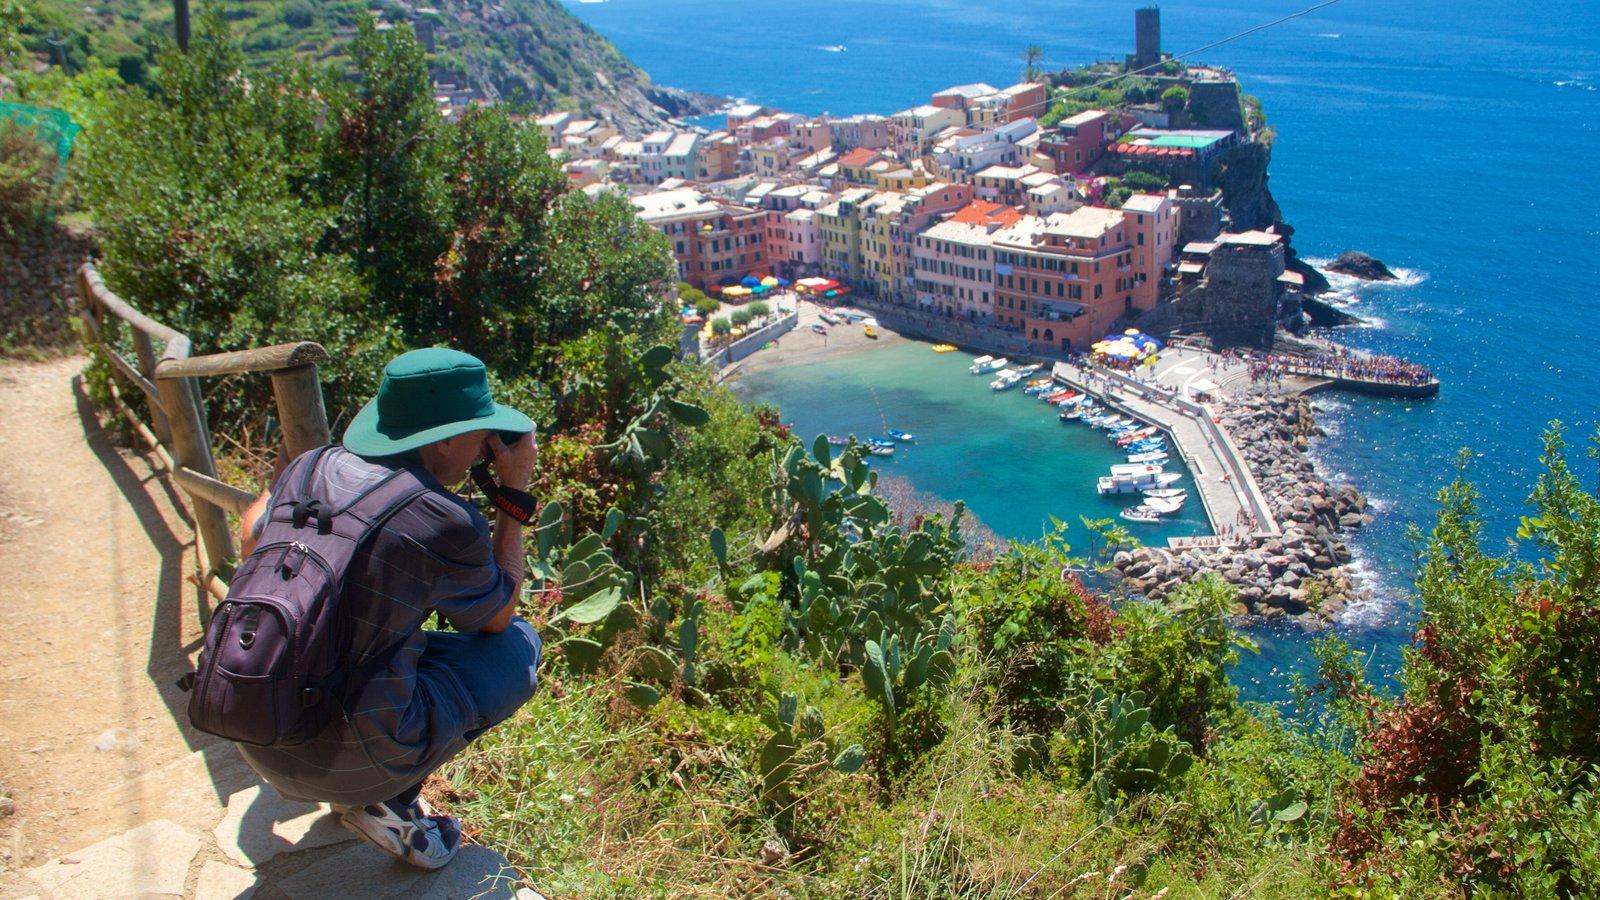 Cinque Terre featuring a coastal town, general coastal views and a bay or harbor